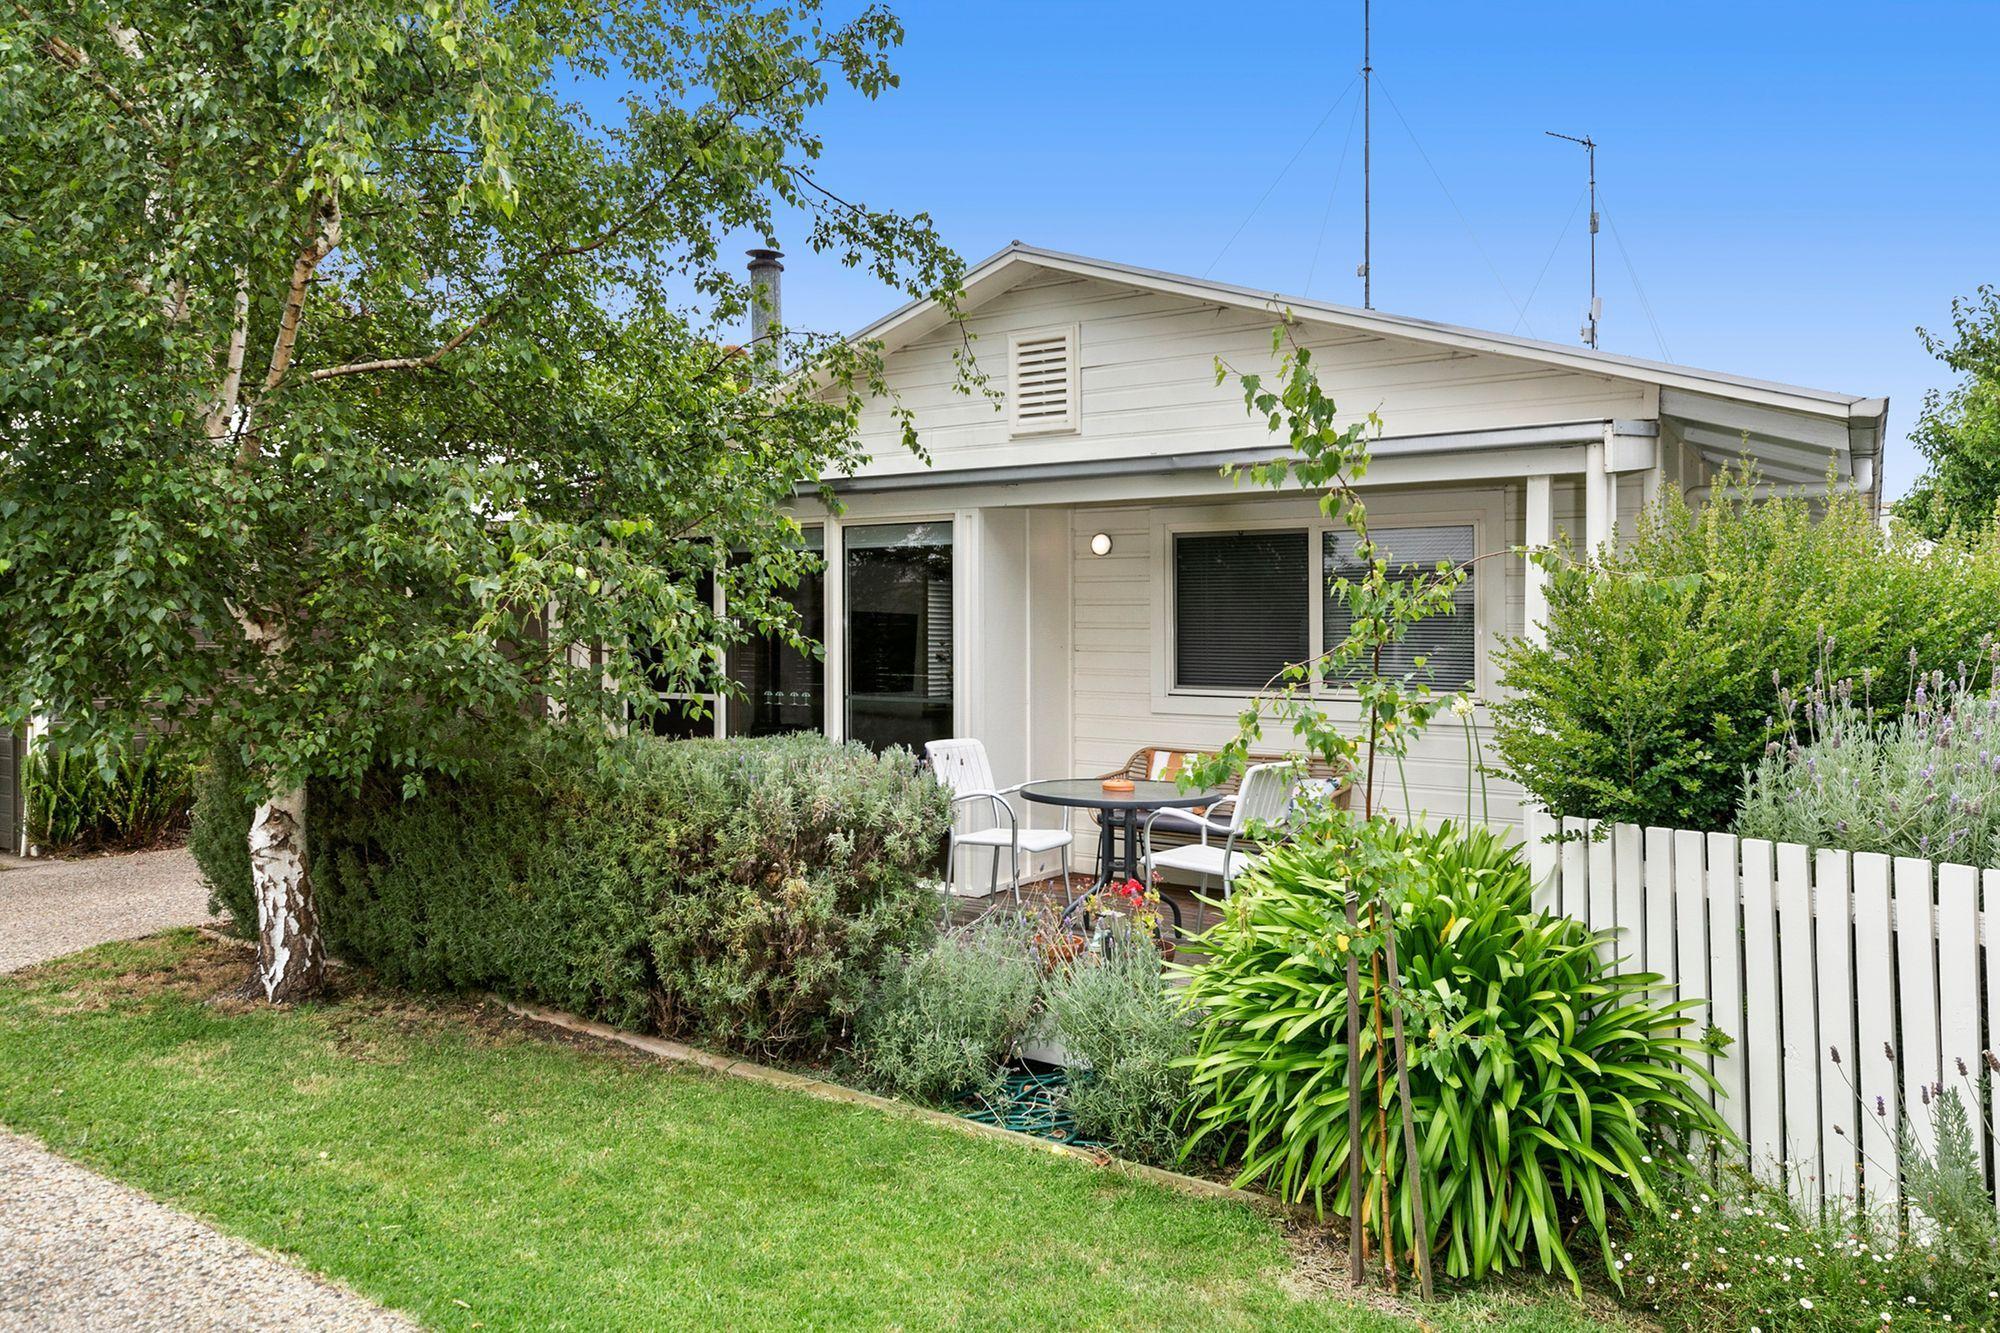 2/5-7 Geelong Road, Barwon Heads VIC 3227